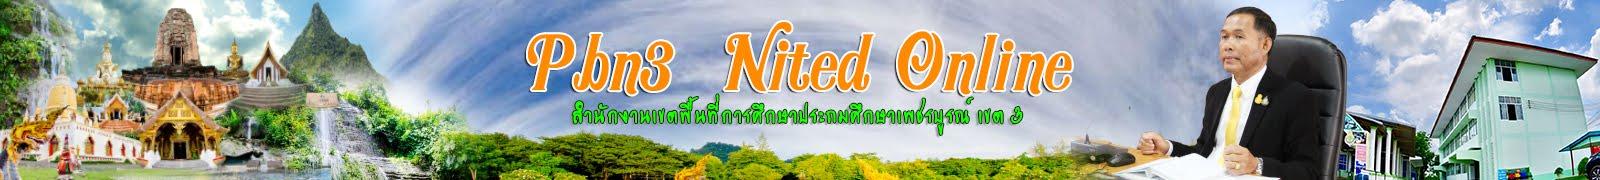 http://vige.pbn3.go.th/